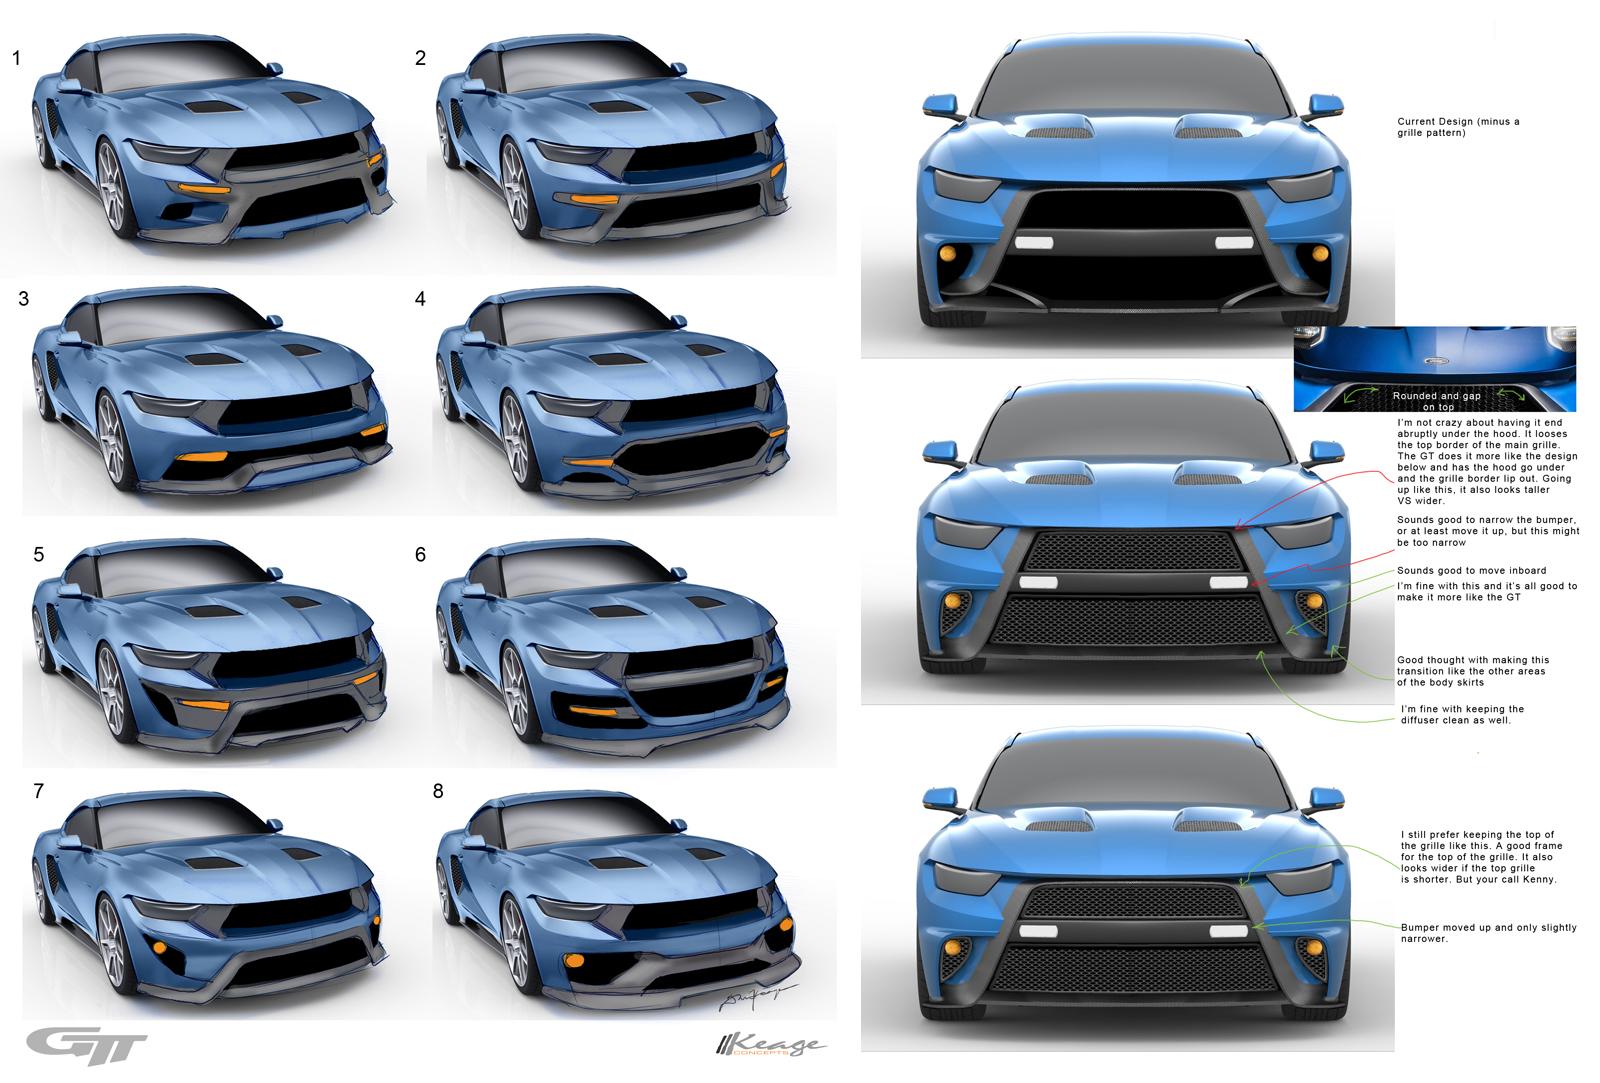 GTT Blue Keage Concepts Calgary Alberta Automotive Design